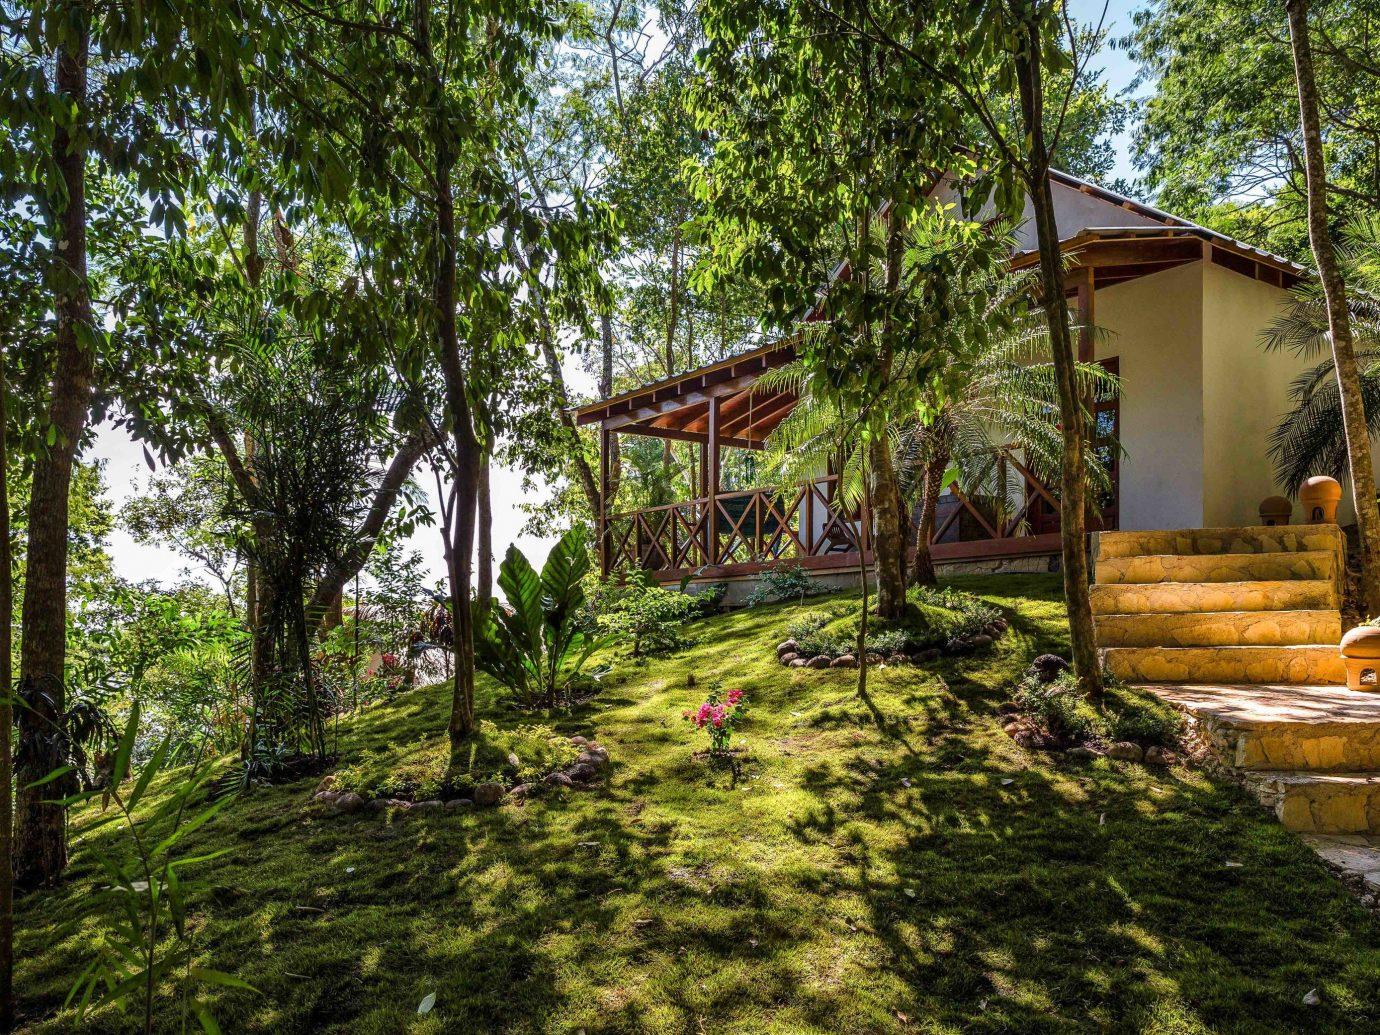 Celebs Hotels tree outdoor grass property cottage Resort real estate estate house plant home Jungle landscape outdoor structure rainforest plantation eco hotel area lush